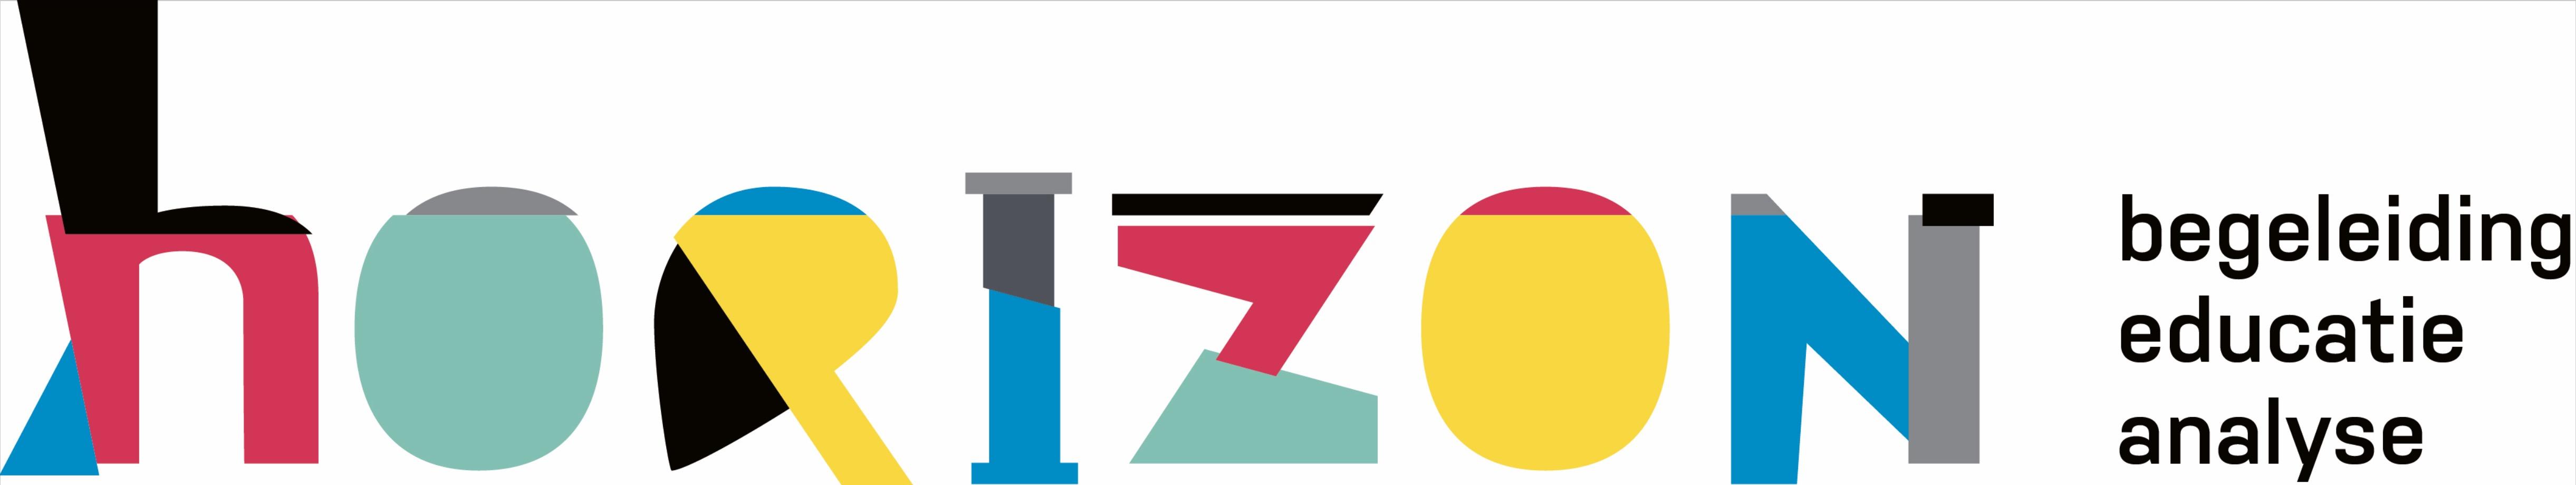 Horizon Begeleiding Logo 2020